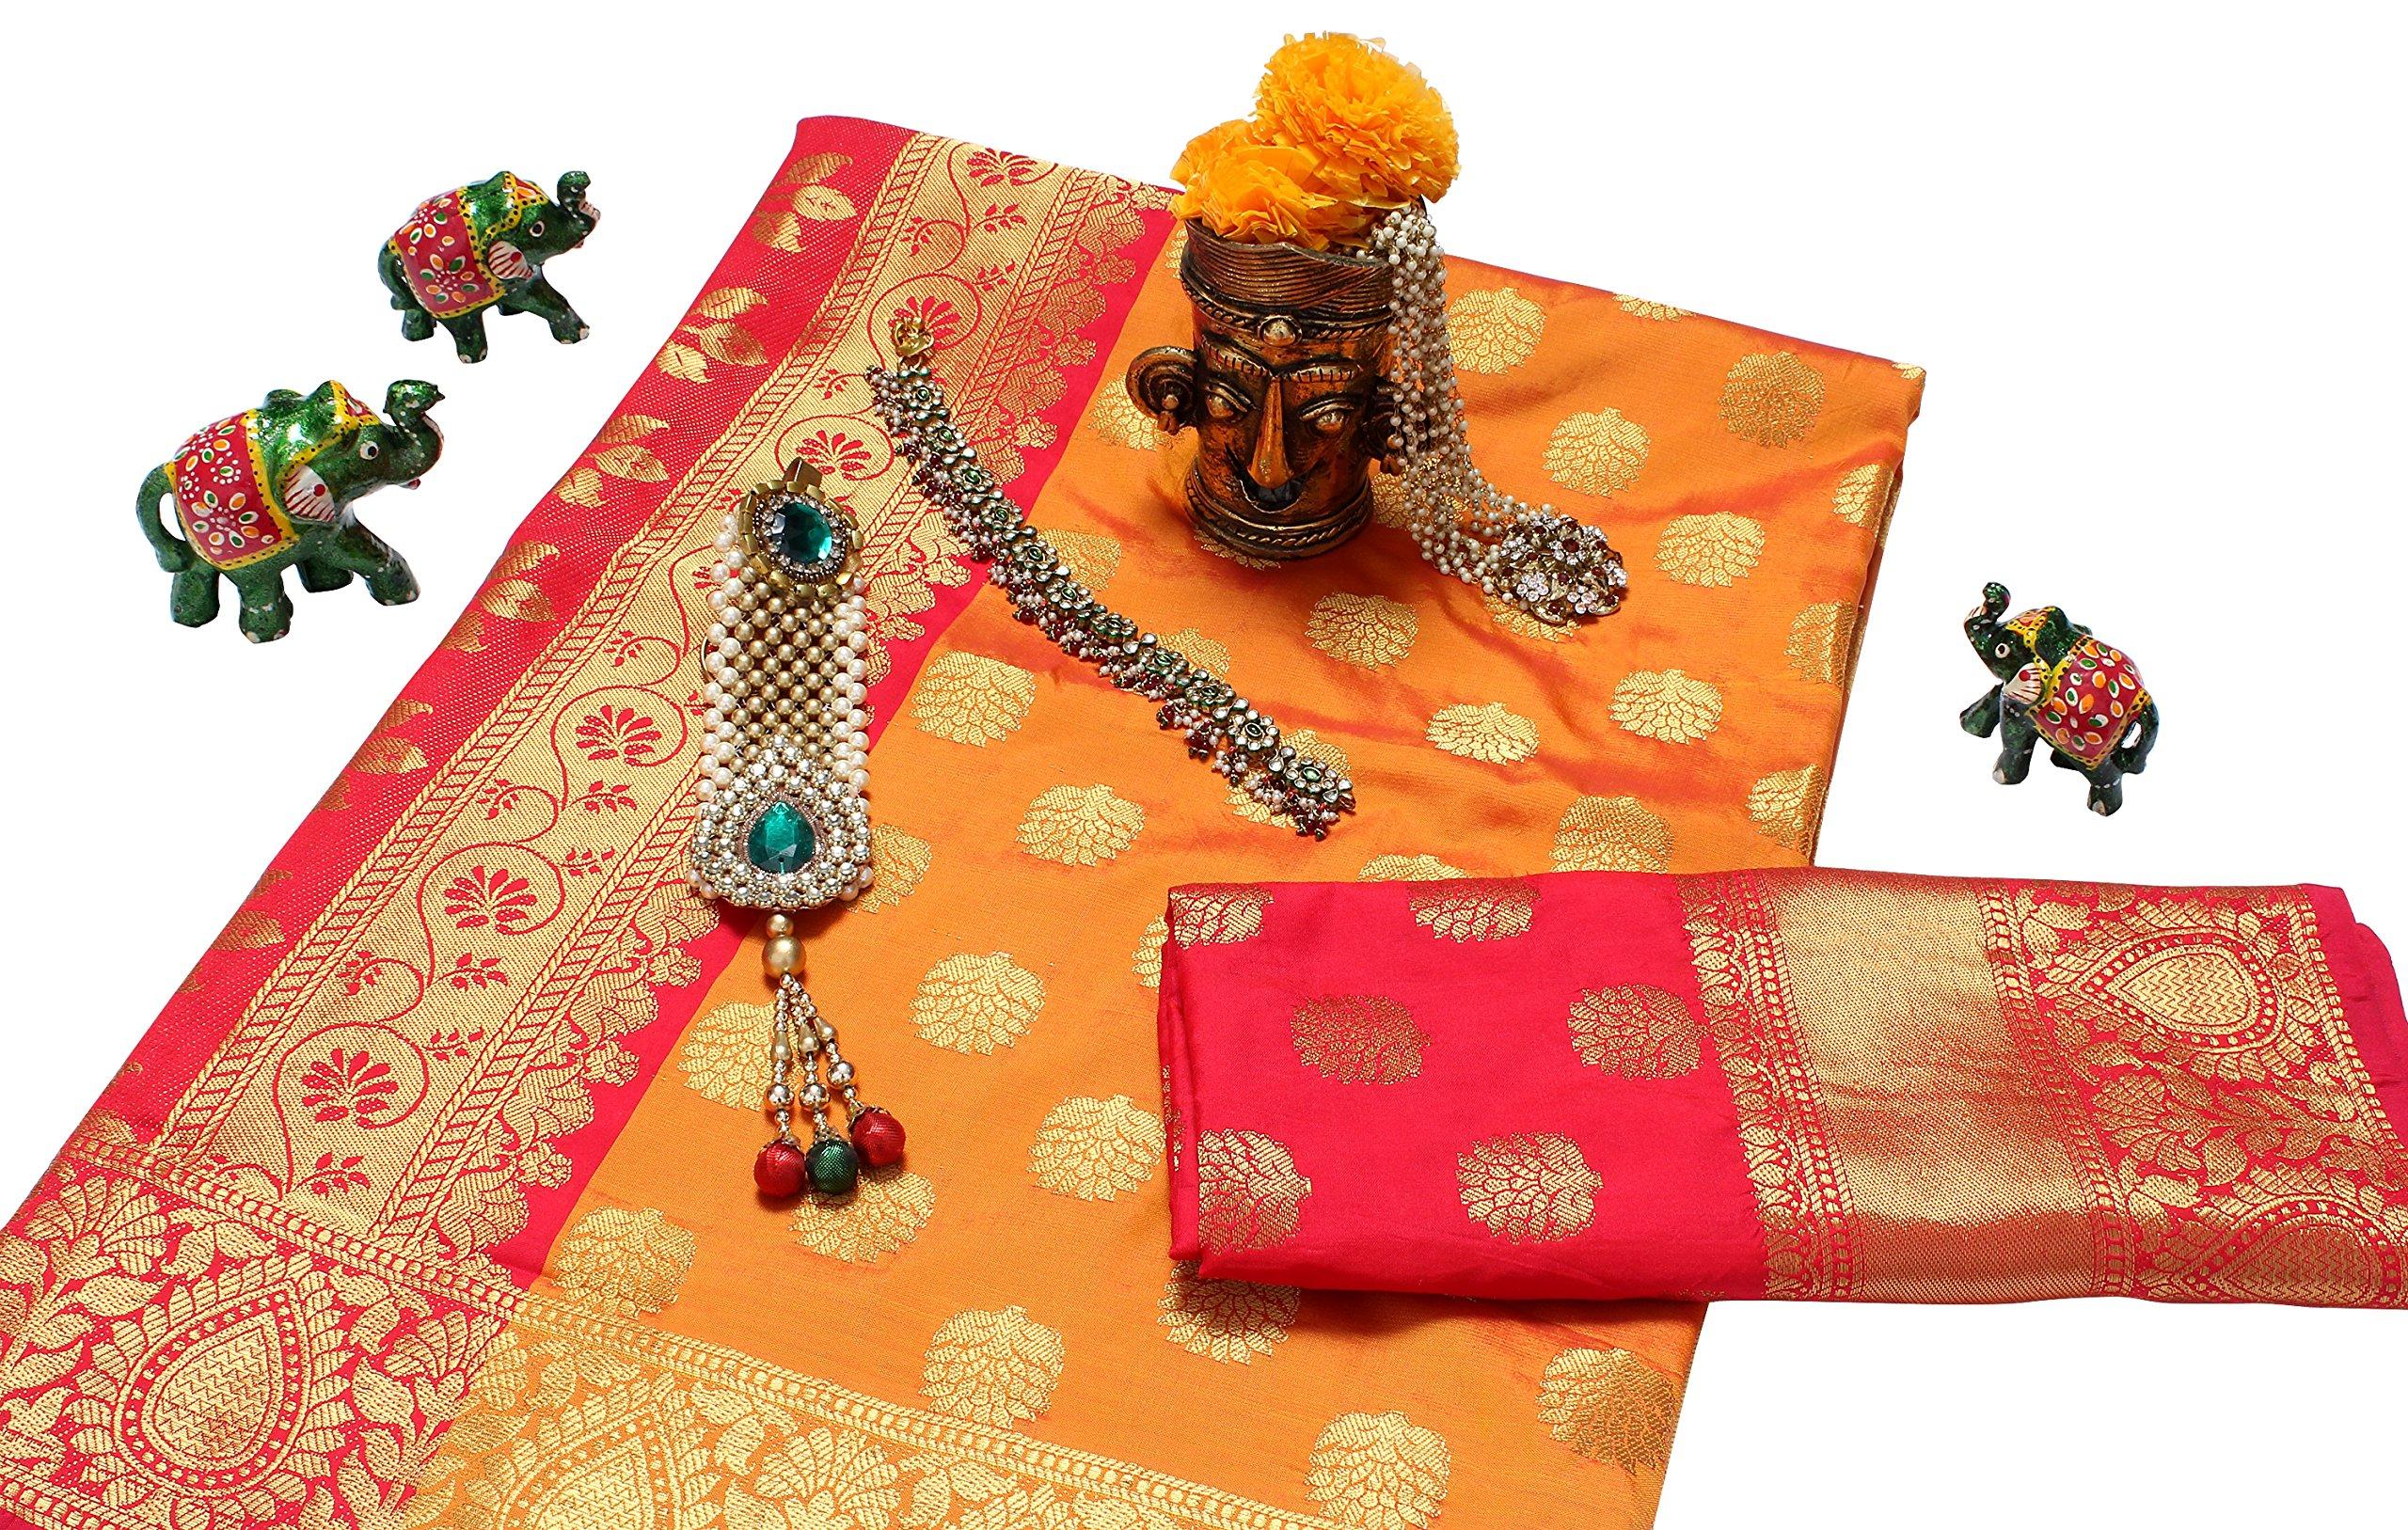 5992d11eebfcc Home   Clothing and Accessories   Women   Ethnic Wear   Sarees   Banarasi  Saree (Varanas Special)   EthnicJunction Booti Work Zari Butta Banarasi Silk  ...